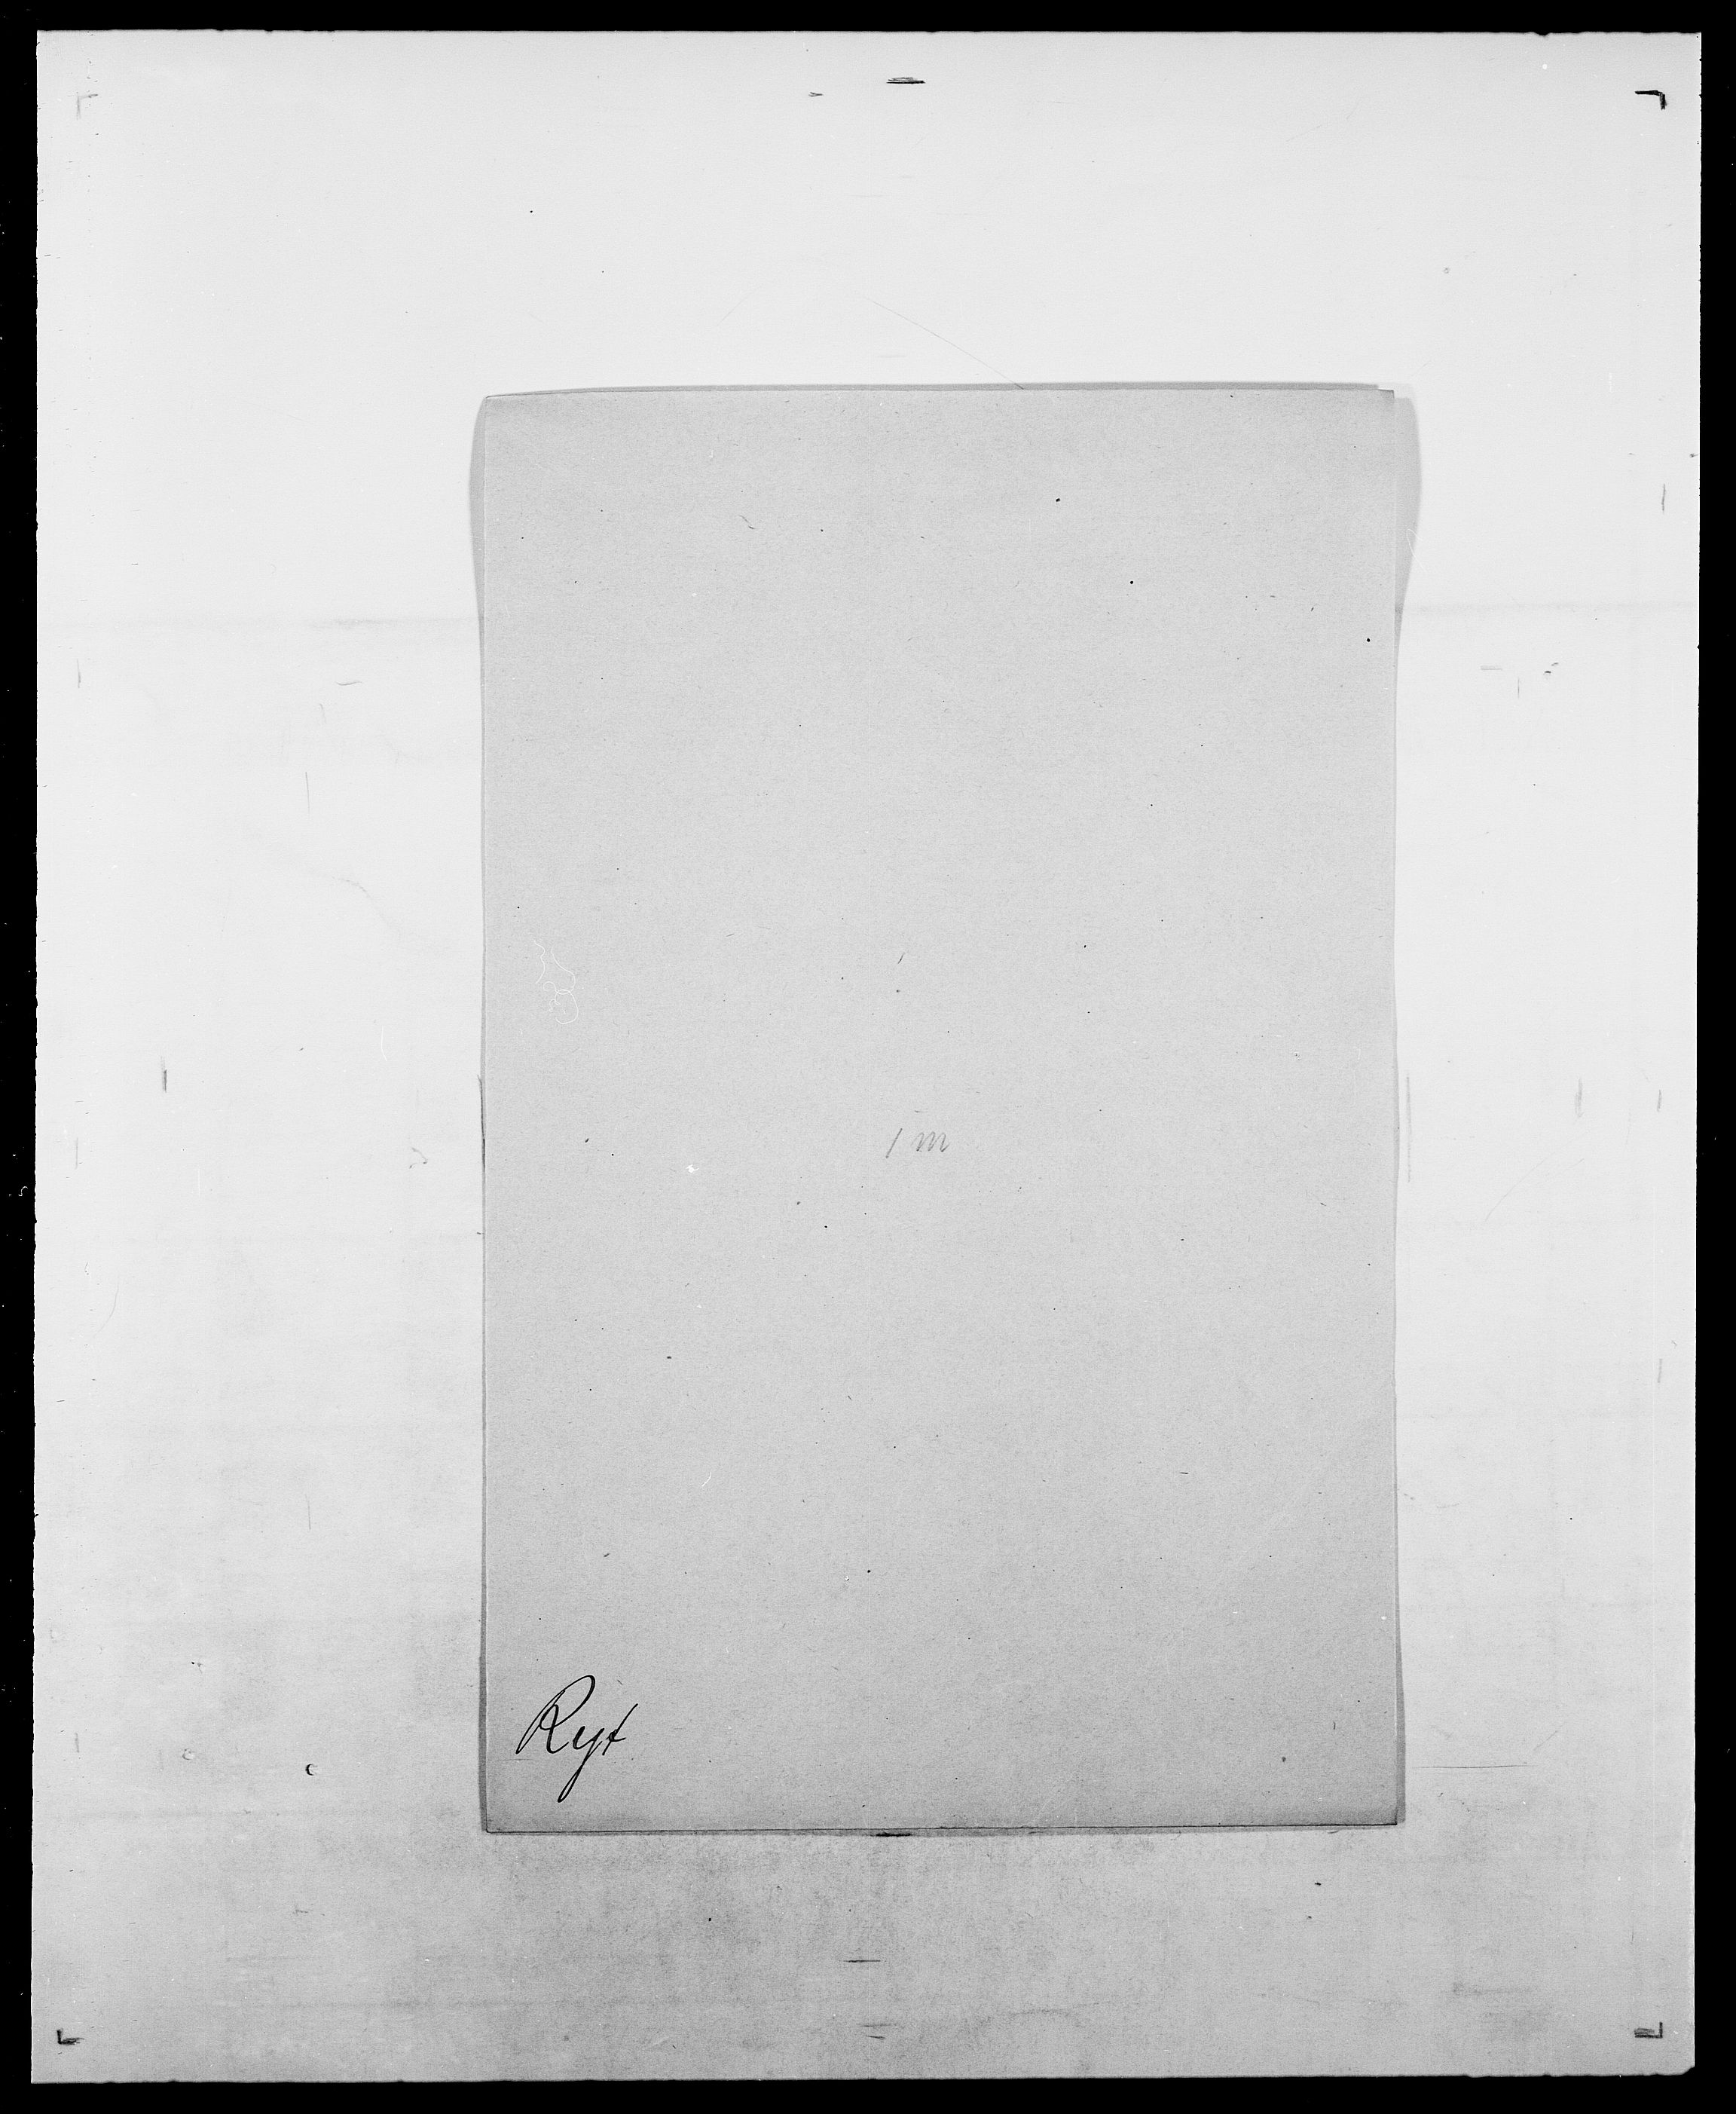 SAO, Delgobe, Charles Antoine - samling, D/Da/L0033: Roald - Røyem, s. 592